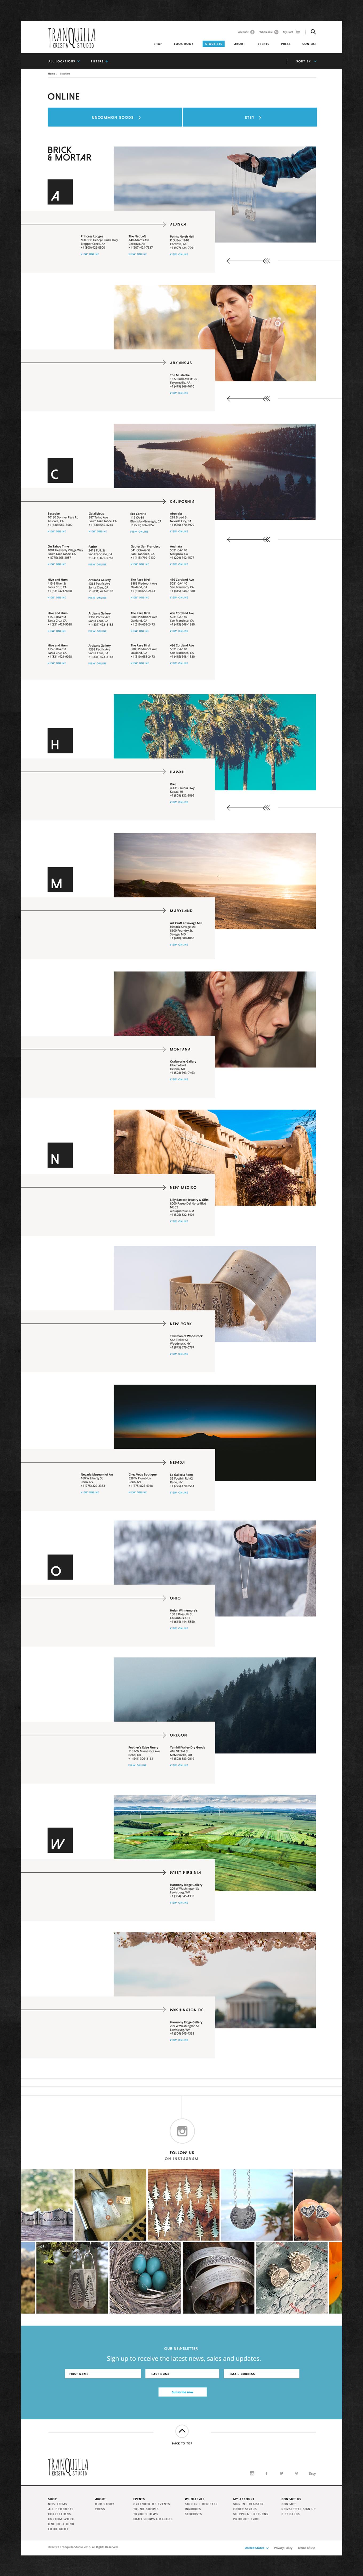 KTS_screen_layout3.png